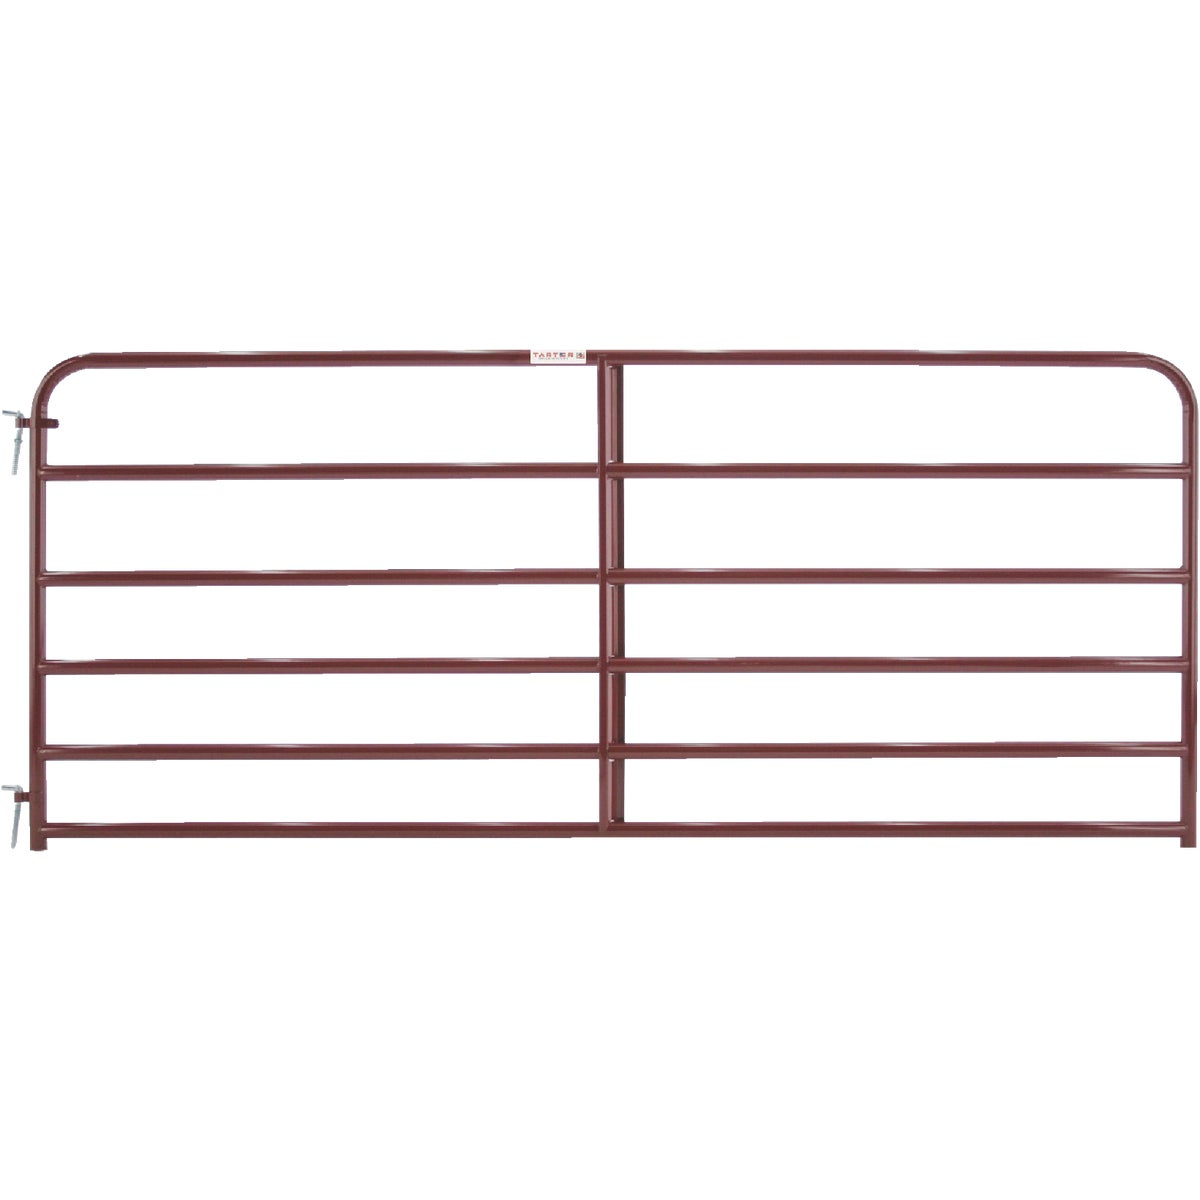 10' 6BAR RED ECONO GATE - 6ER10 by Tarter Llc